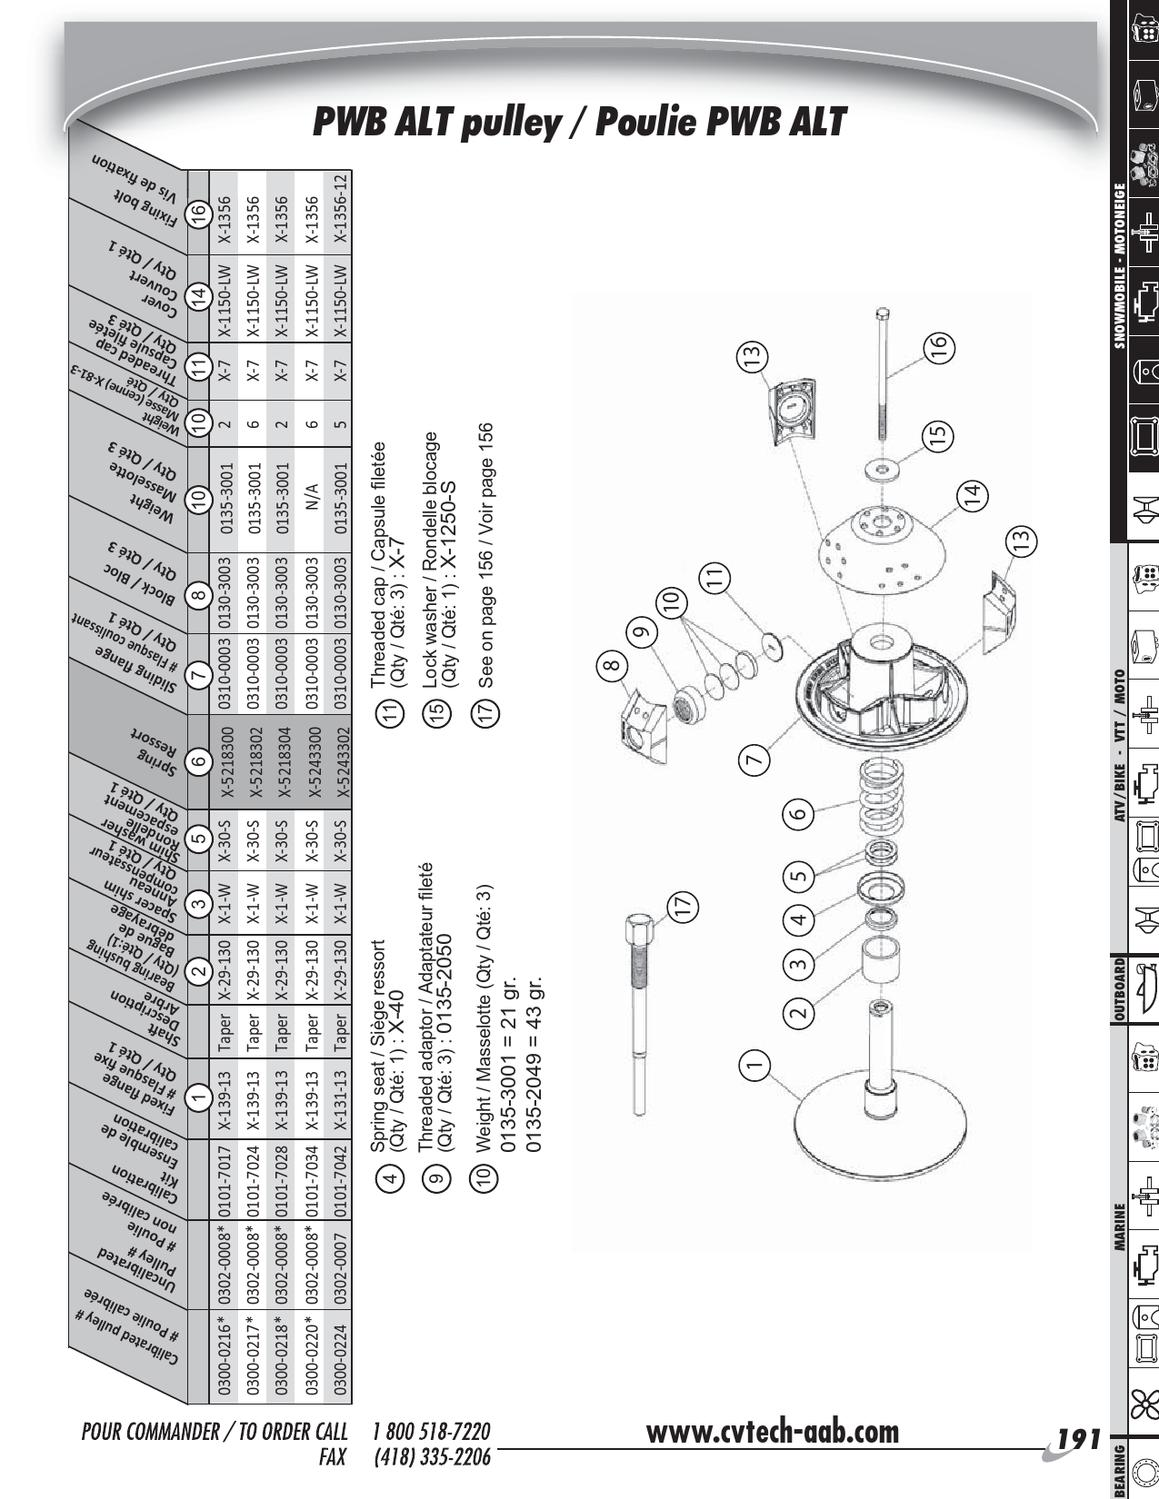 bs FIG300 K-MI300-14N, K line fonte malléable raccords bspt bouchon 1//4 blk